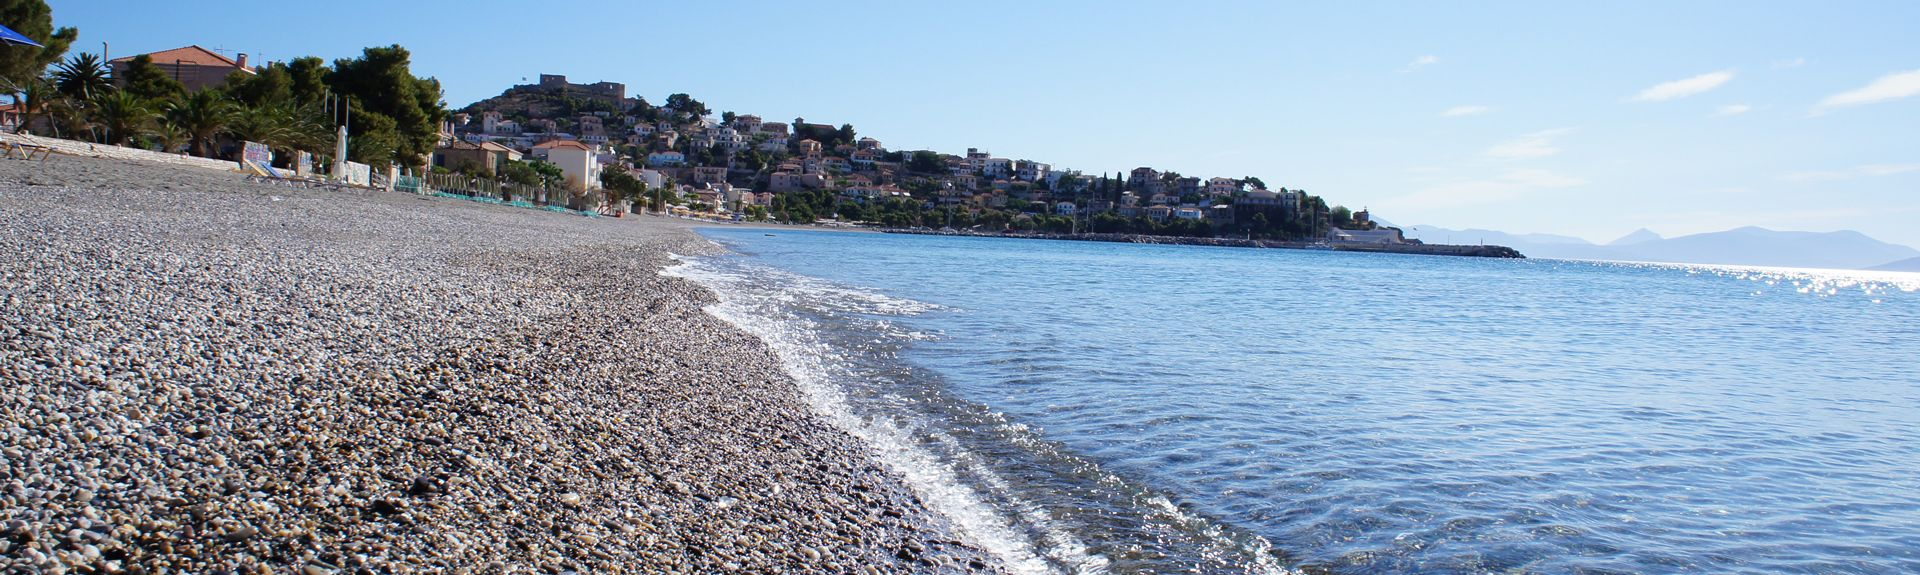 Süd Kynouria, Peloponnes, Griechenland